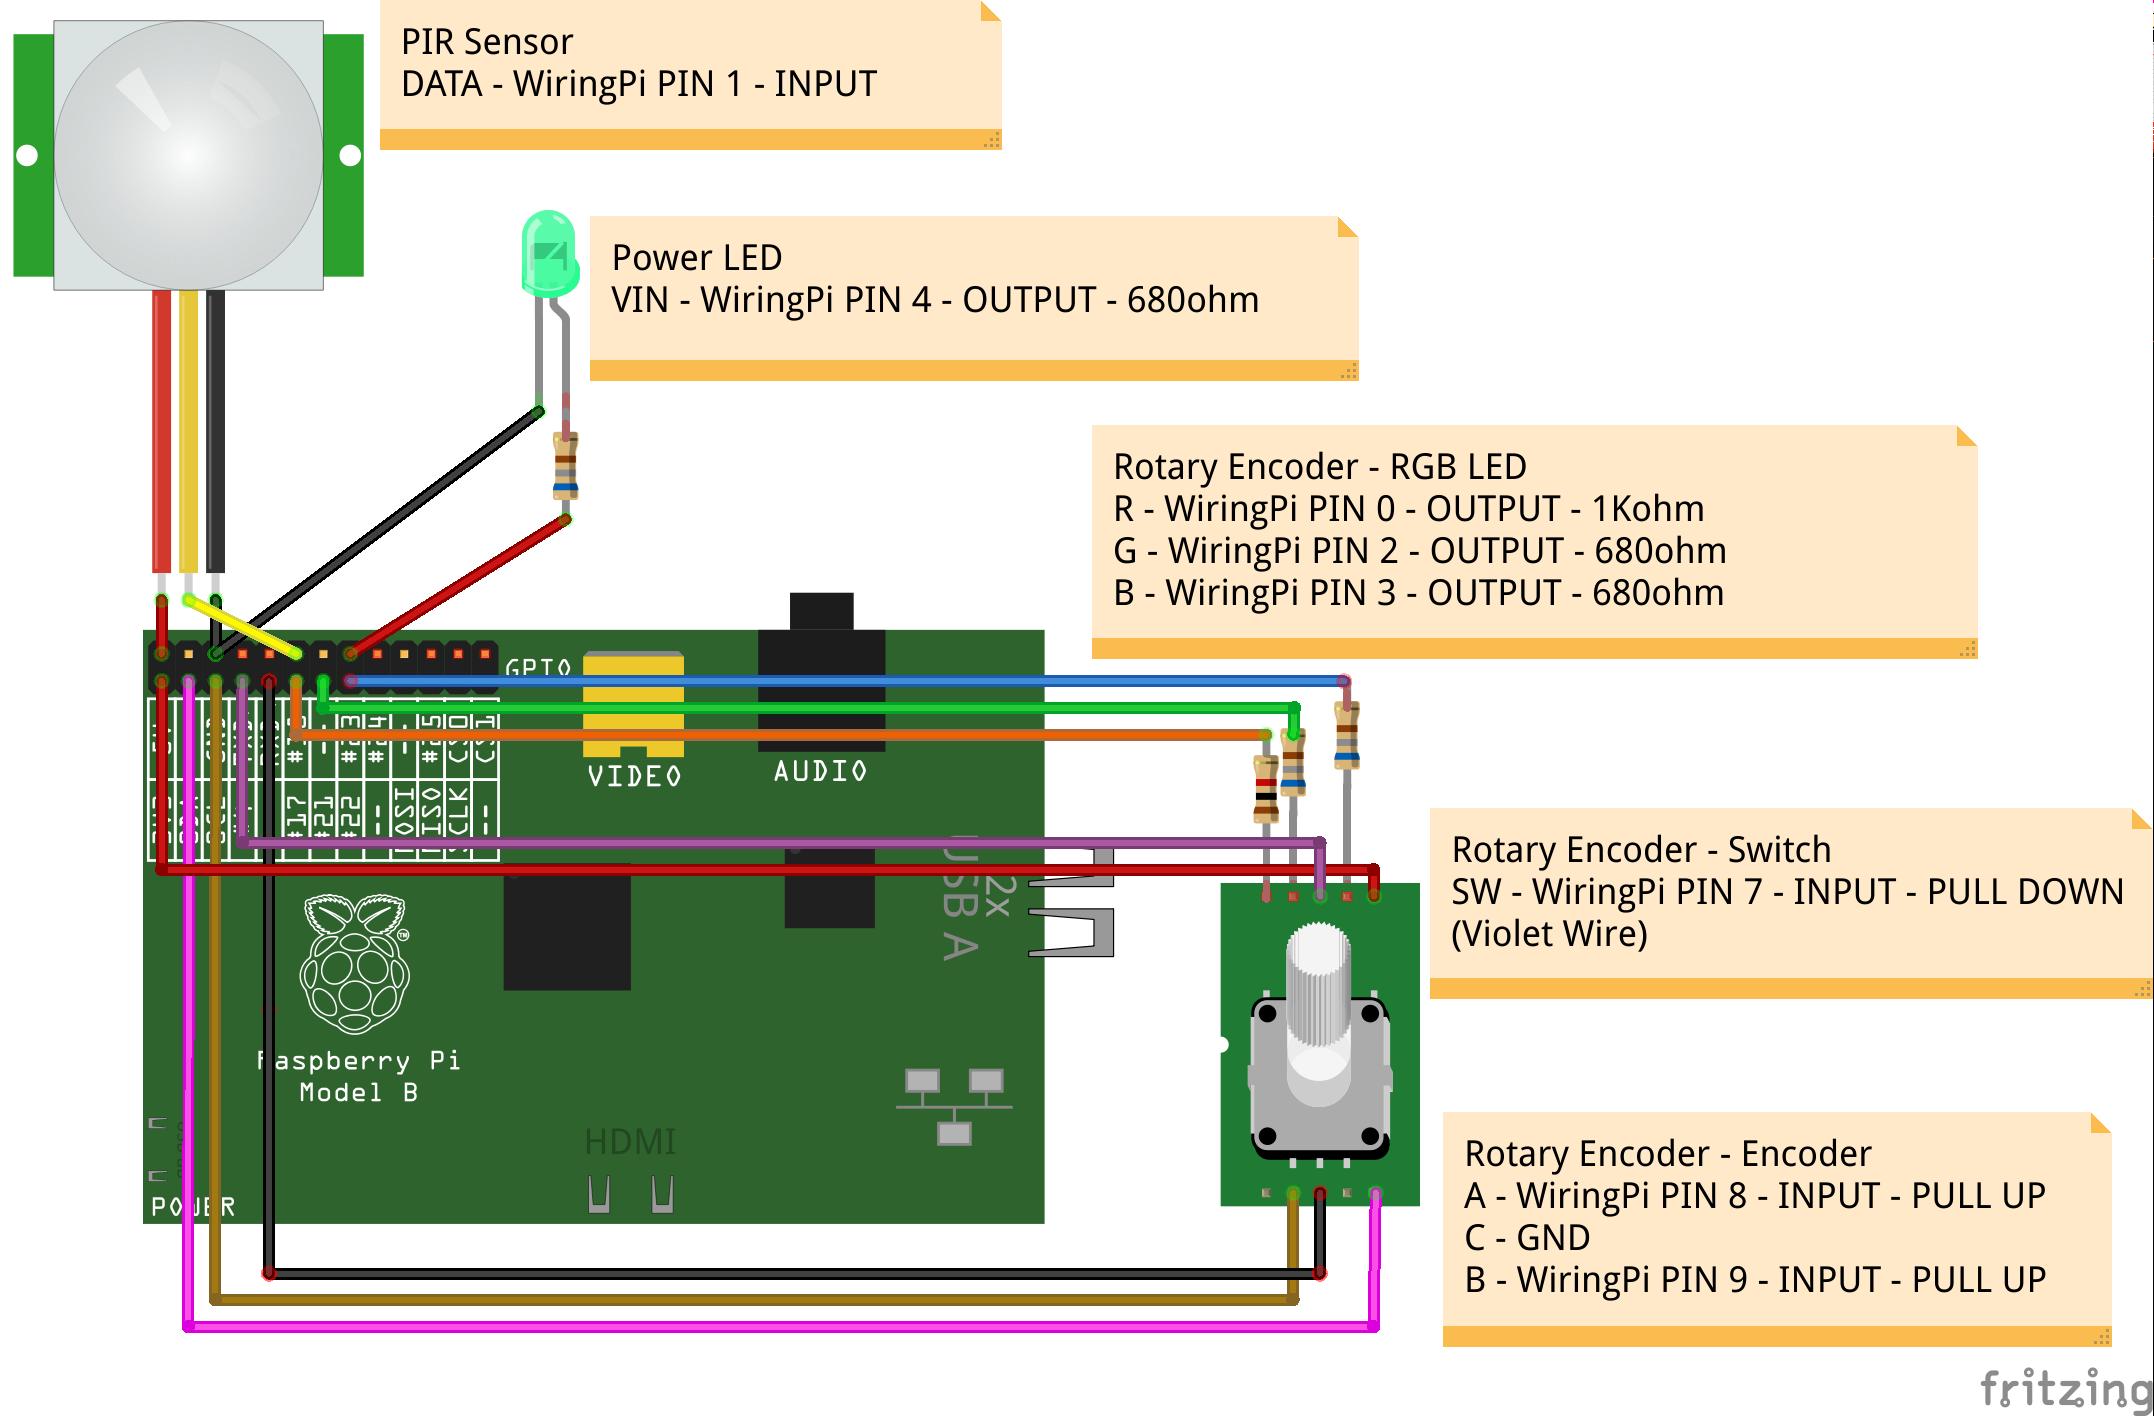 motion sensor webradio hackster io rh hackster io Rotary Encoder Arduino Rotary Encoder Circuit